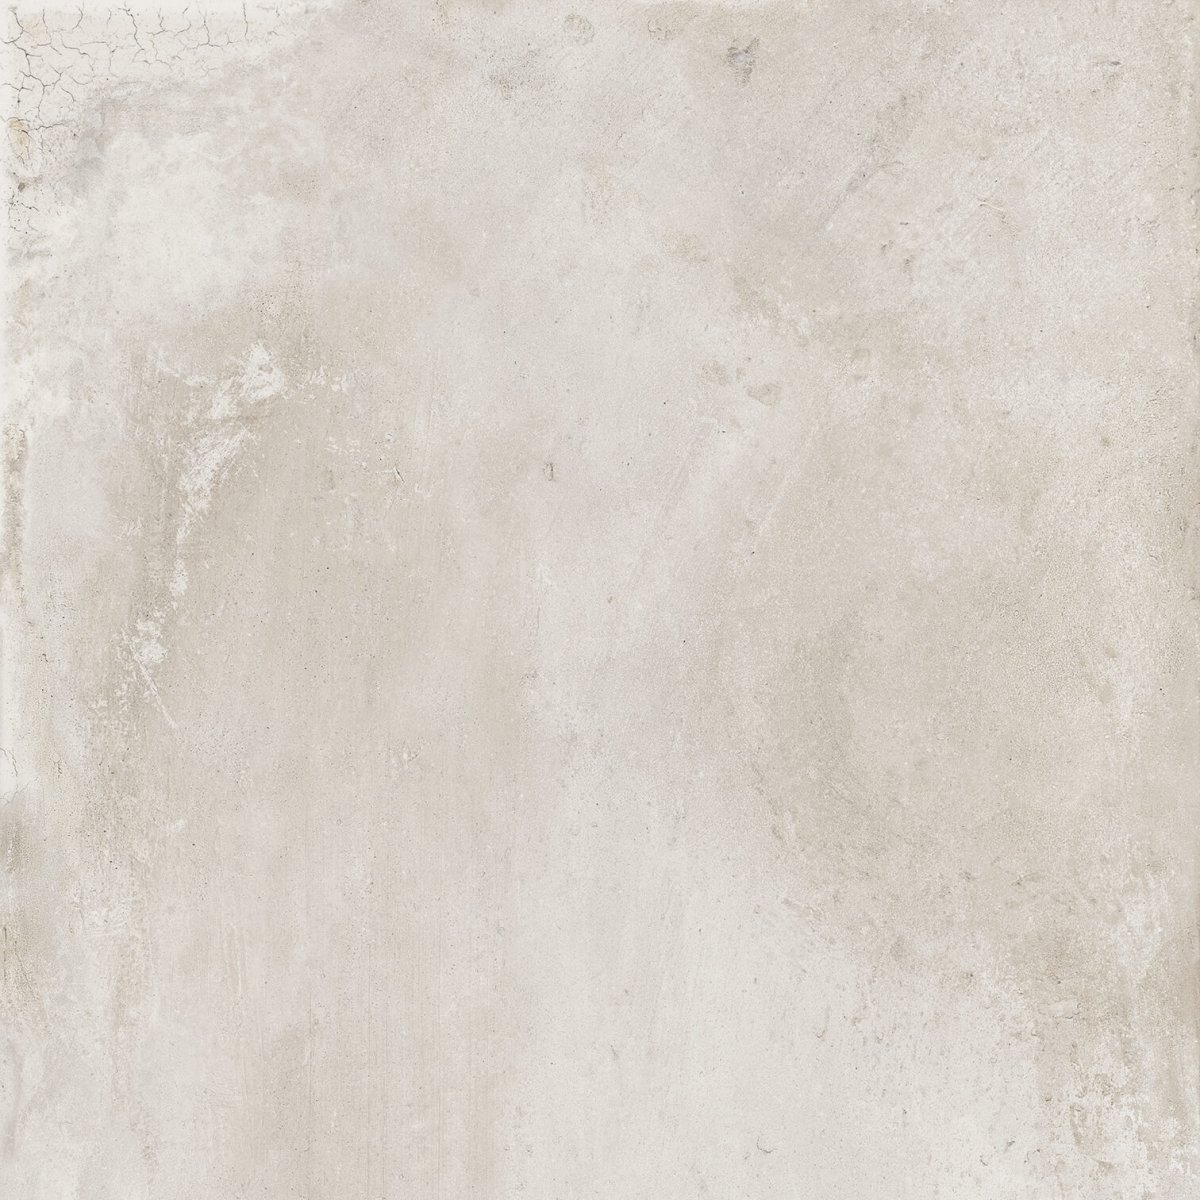 Florim Beton One Chalk 600x600mm_Stiles_Product_Image